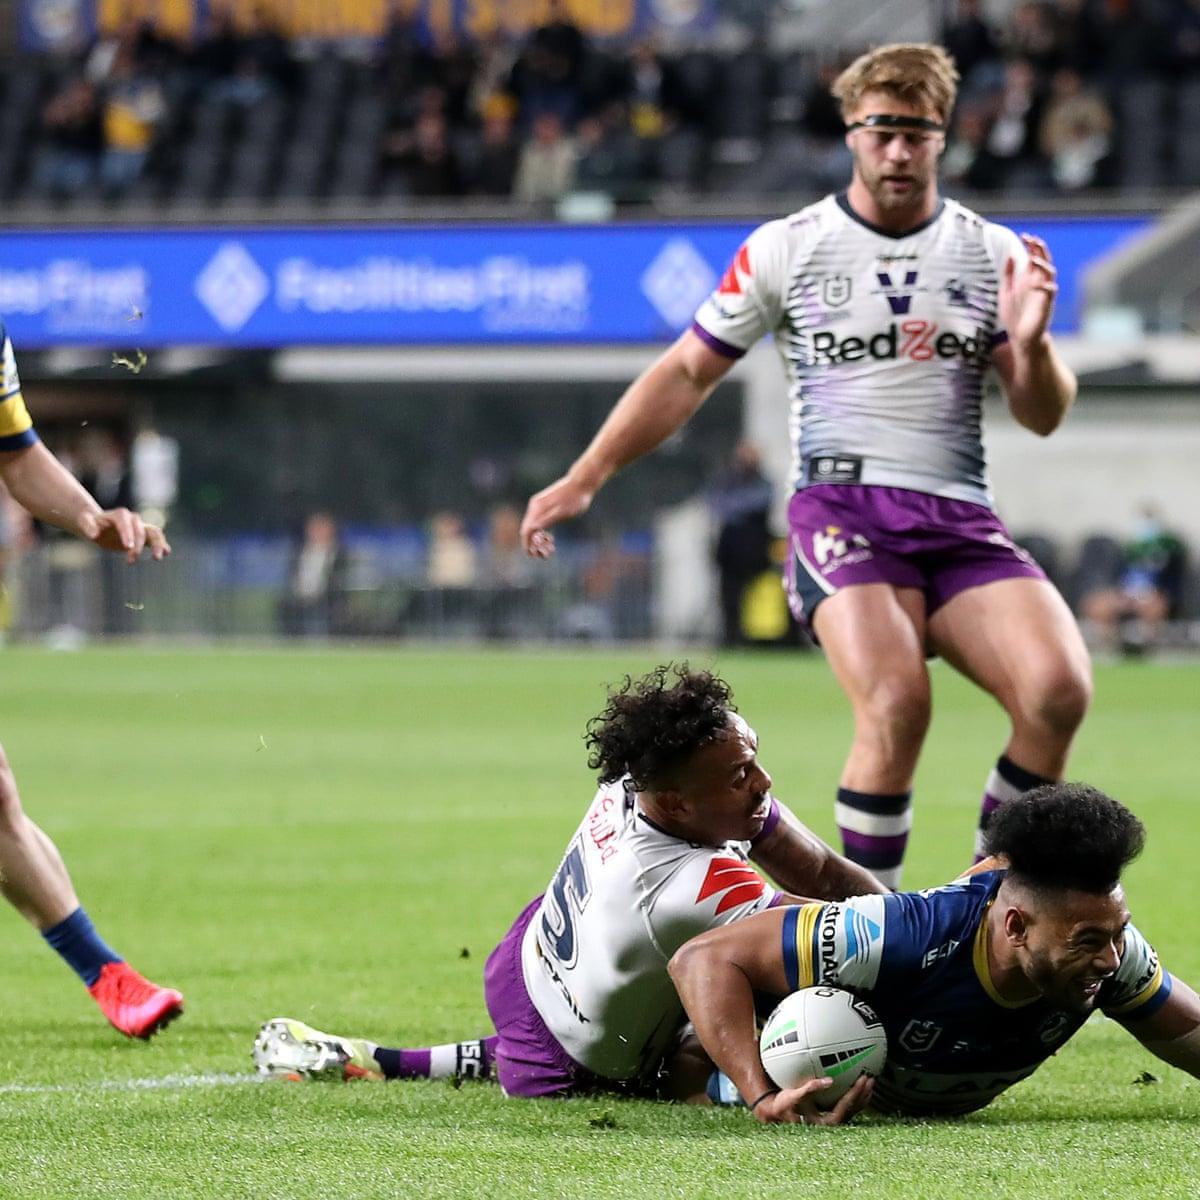 Nrl 2020 Round 15 Parramatta Eels Shutout Melbourne Storm As It Happened Sport The Guardian